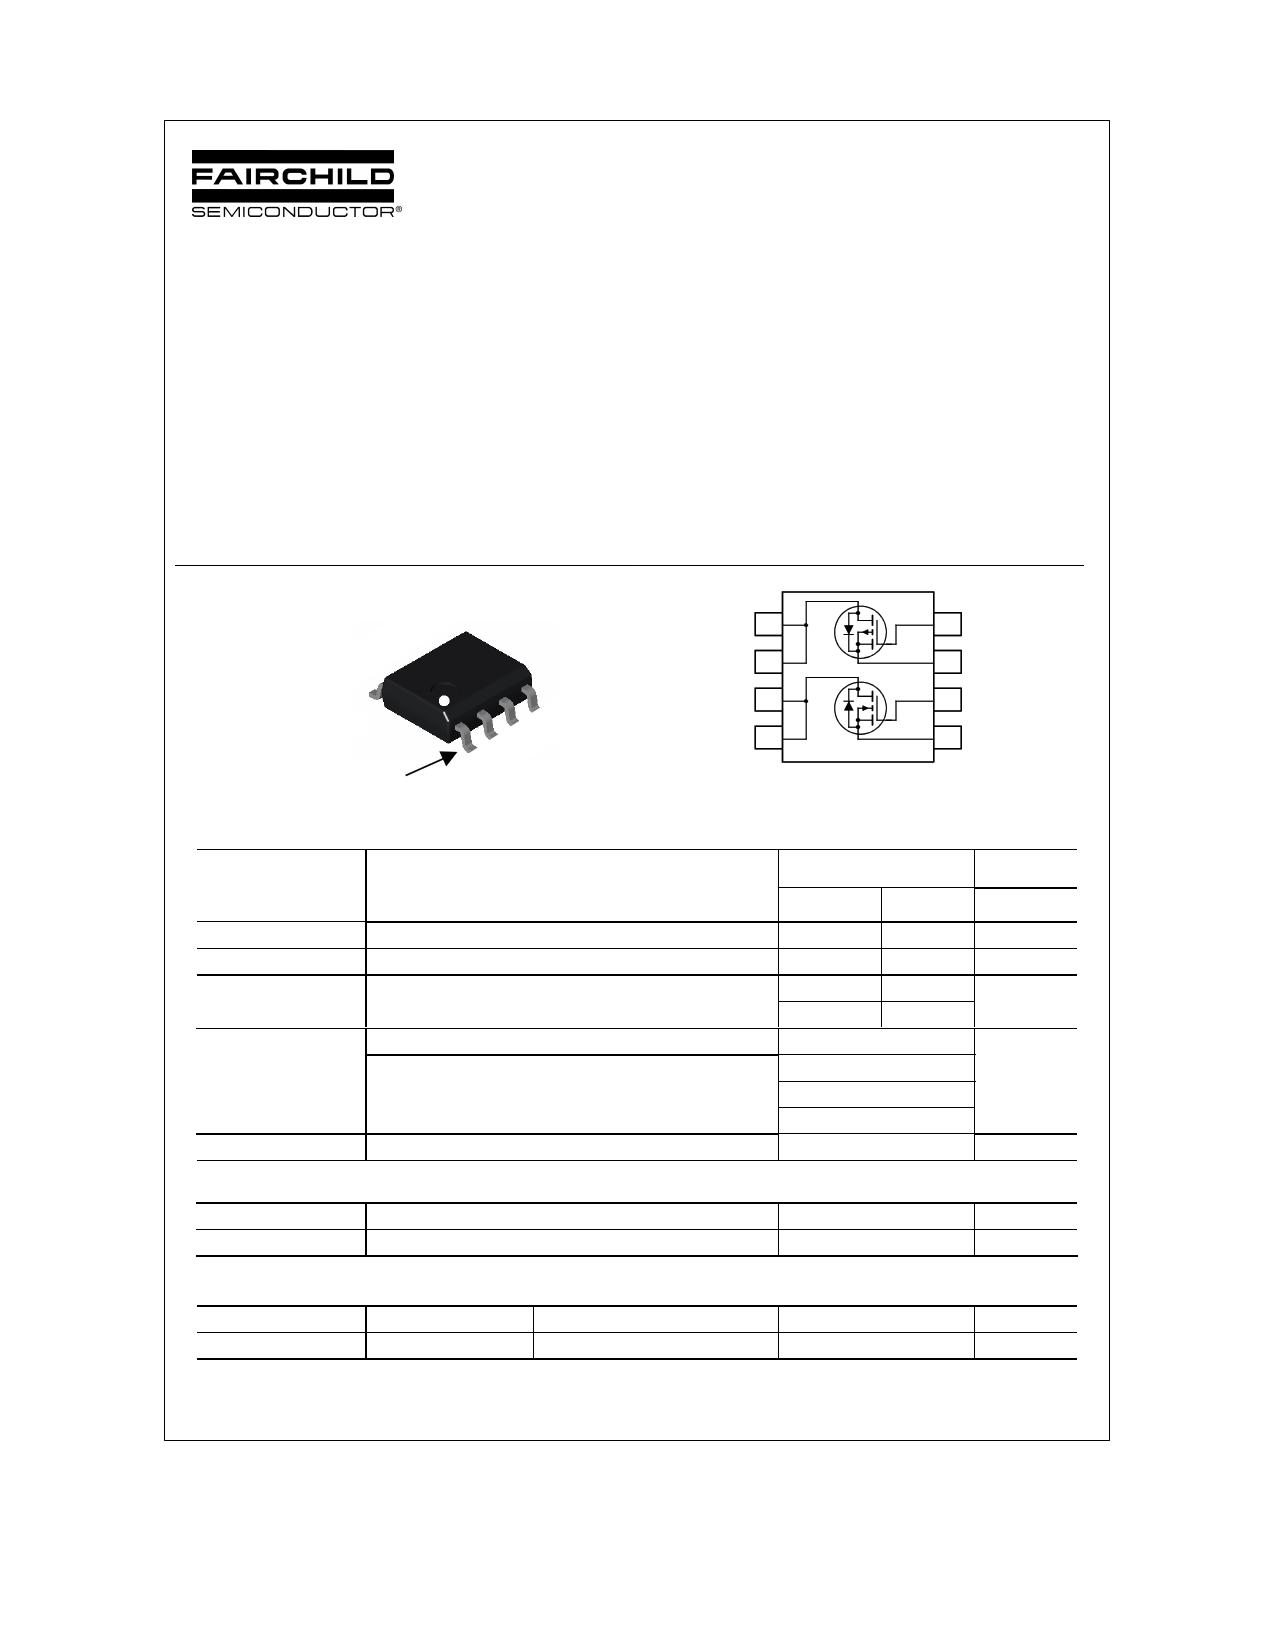 FDS9934C 데이터시트 및 FDS9934C PDF